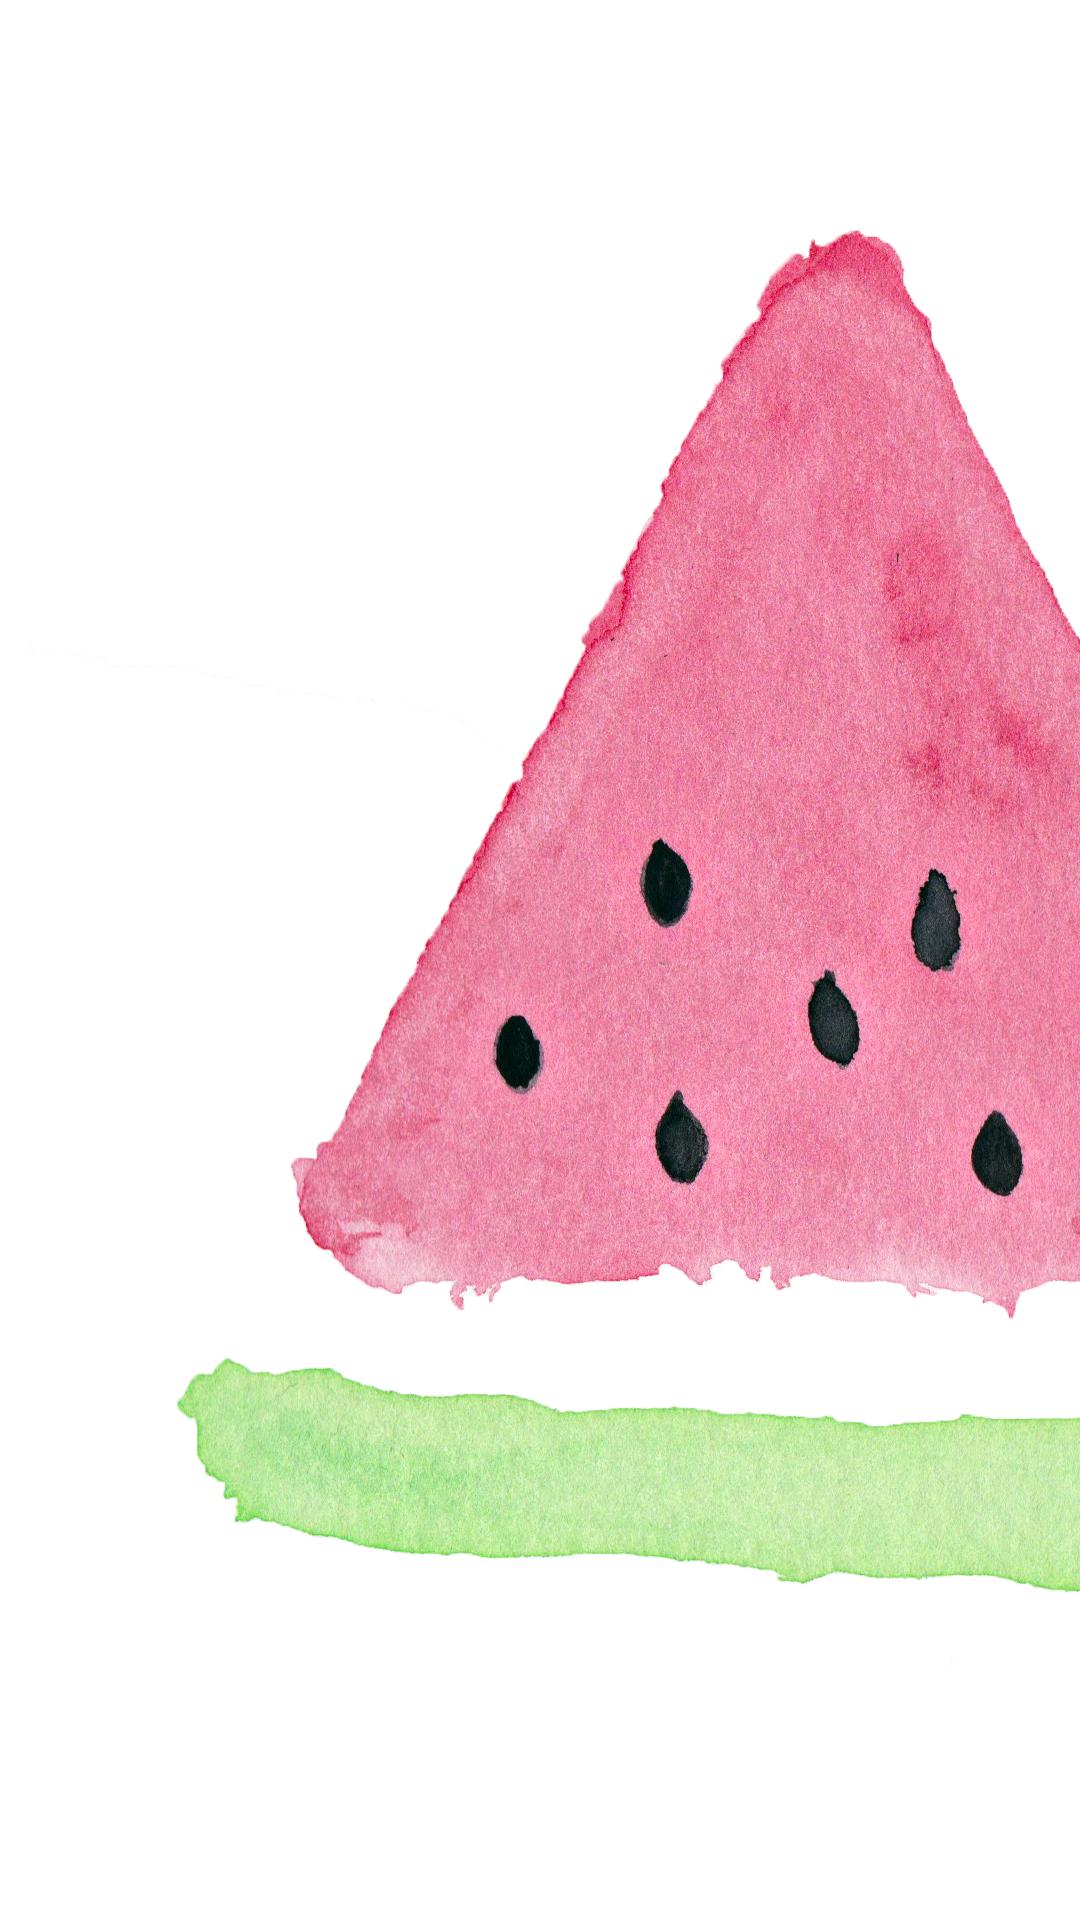 [75+] Watermelon Wallpaper on WallpaperSafari